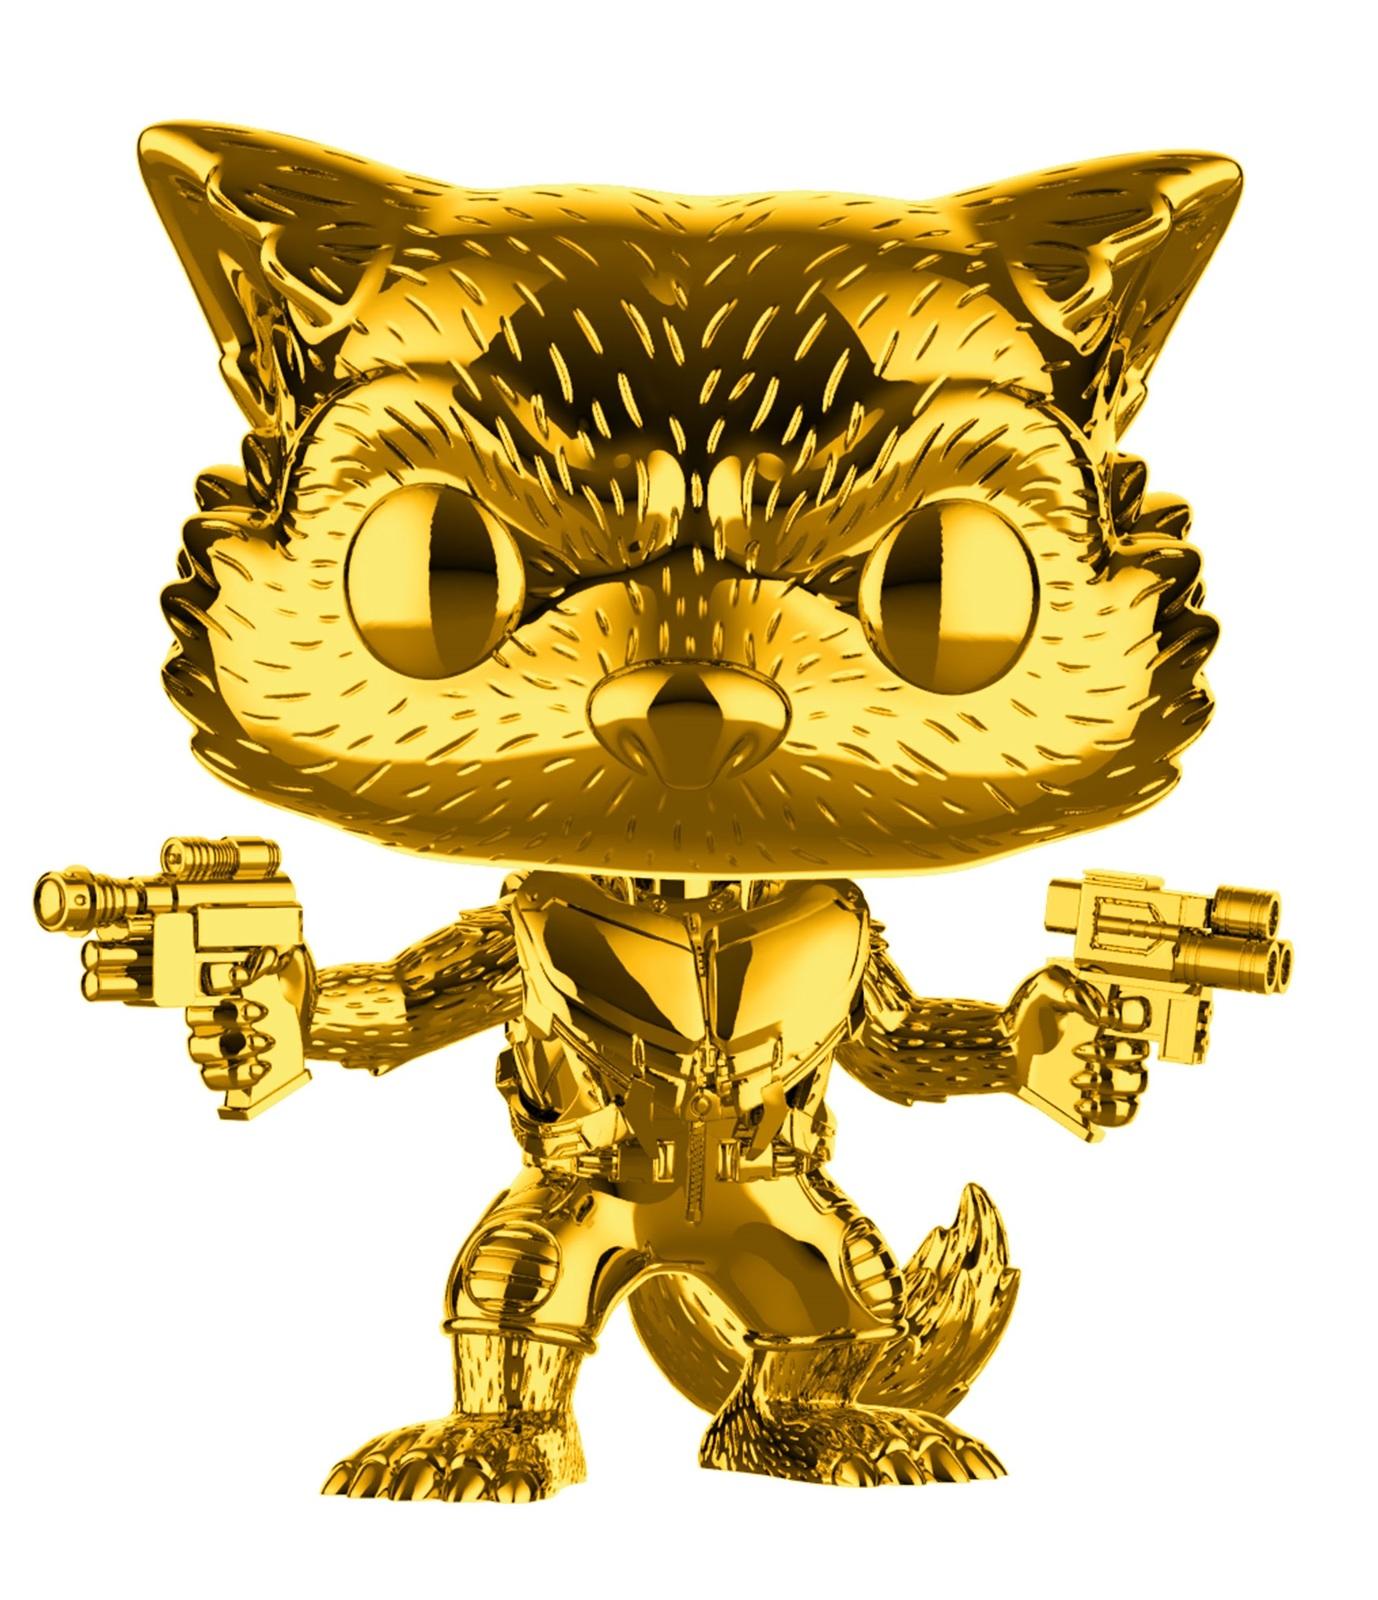 Marvel Studios - Rocket Raccoon (Gold Chrome) Pop! Vinyl Figure image